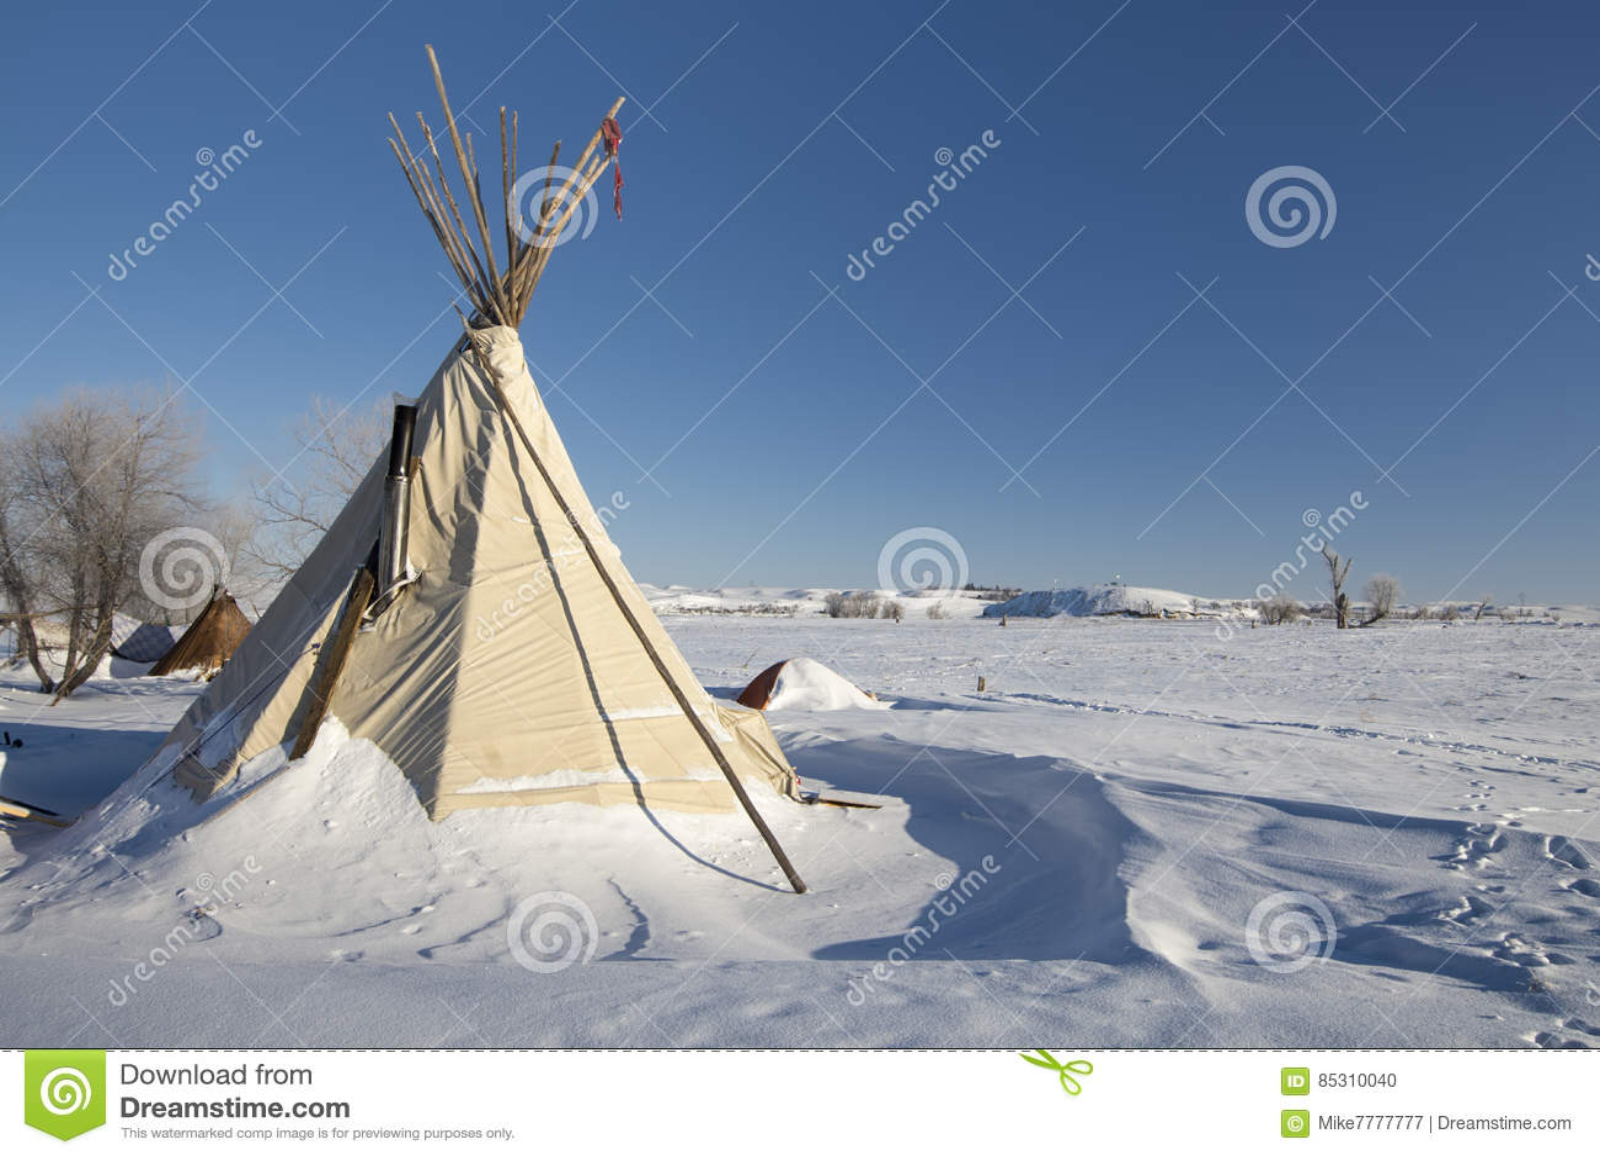 Tipi på kanten av det Oceti Sakowin lägret med sköldpaddakullen i bakgrund, kanonboll, North Dakota, USA, Januari 2017